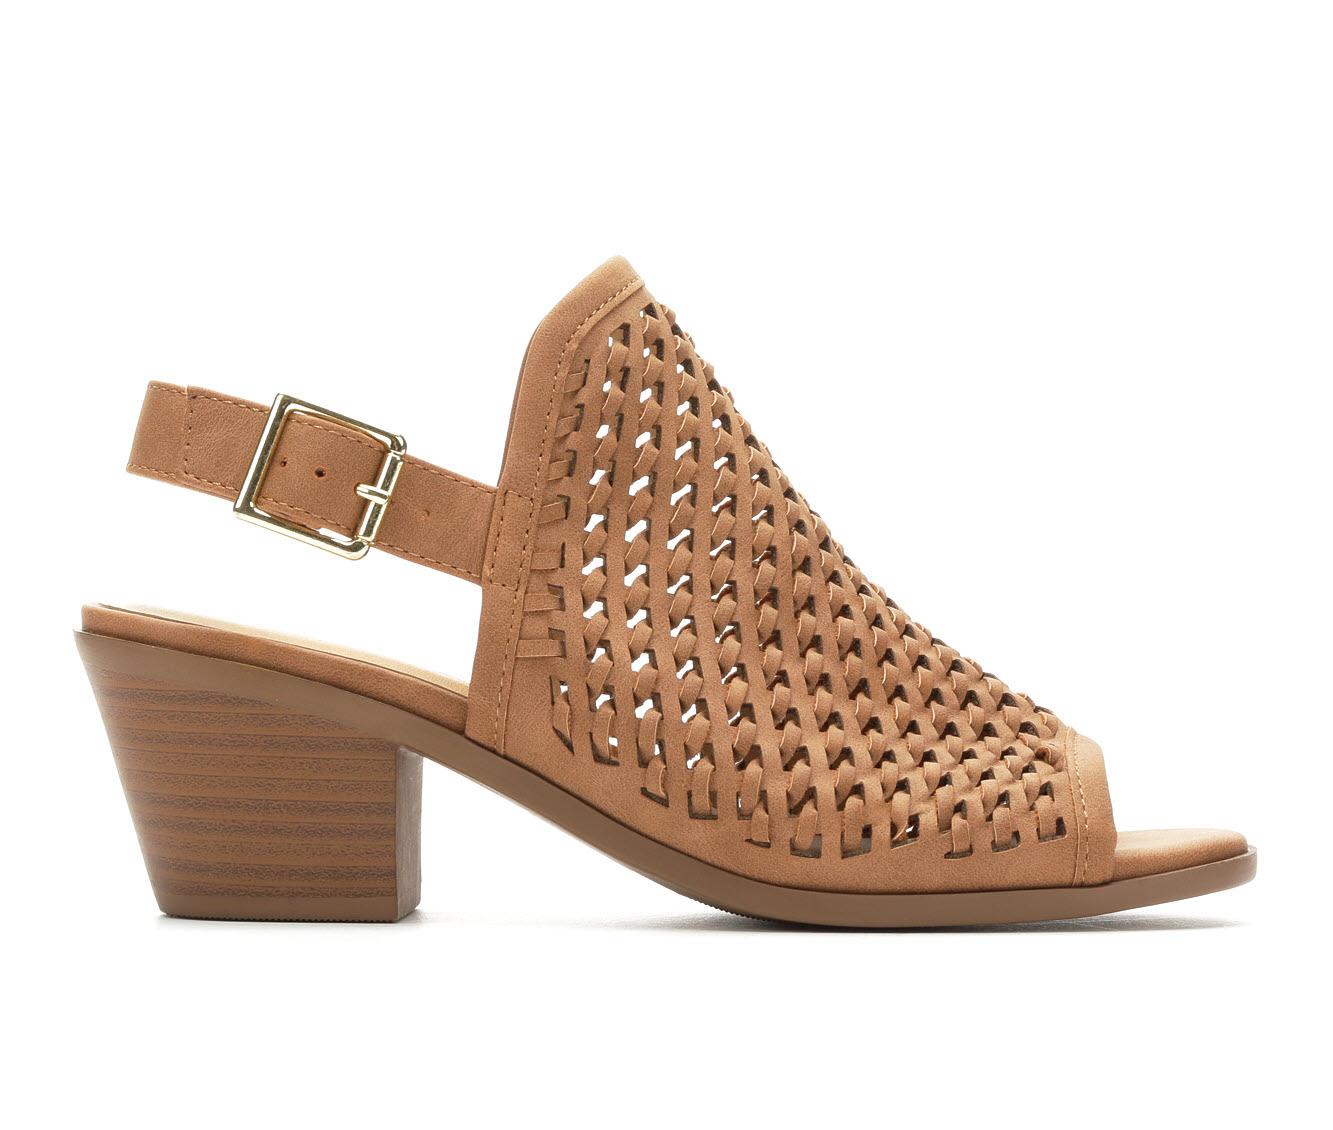 Solanz Abigail Women's Dress Shoe (Beige Faux Leather)